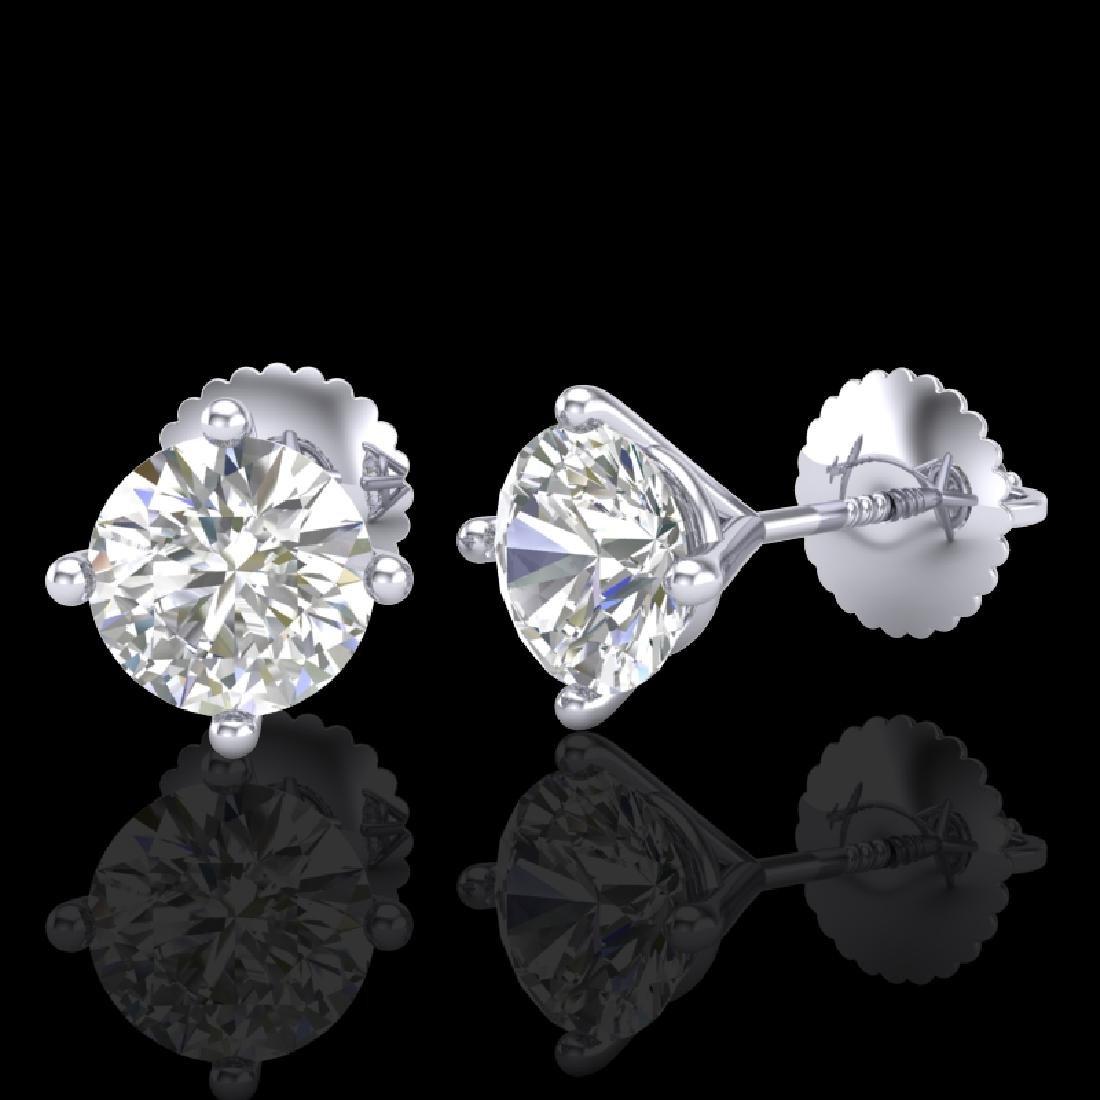 1.5 CTW VS/SI Diamond Solitaire Art Deco Stud Earrings